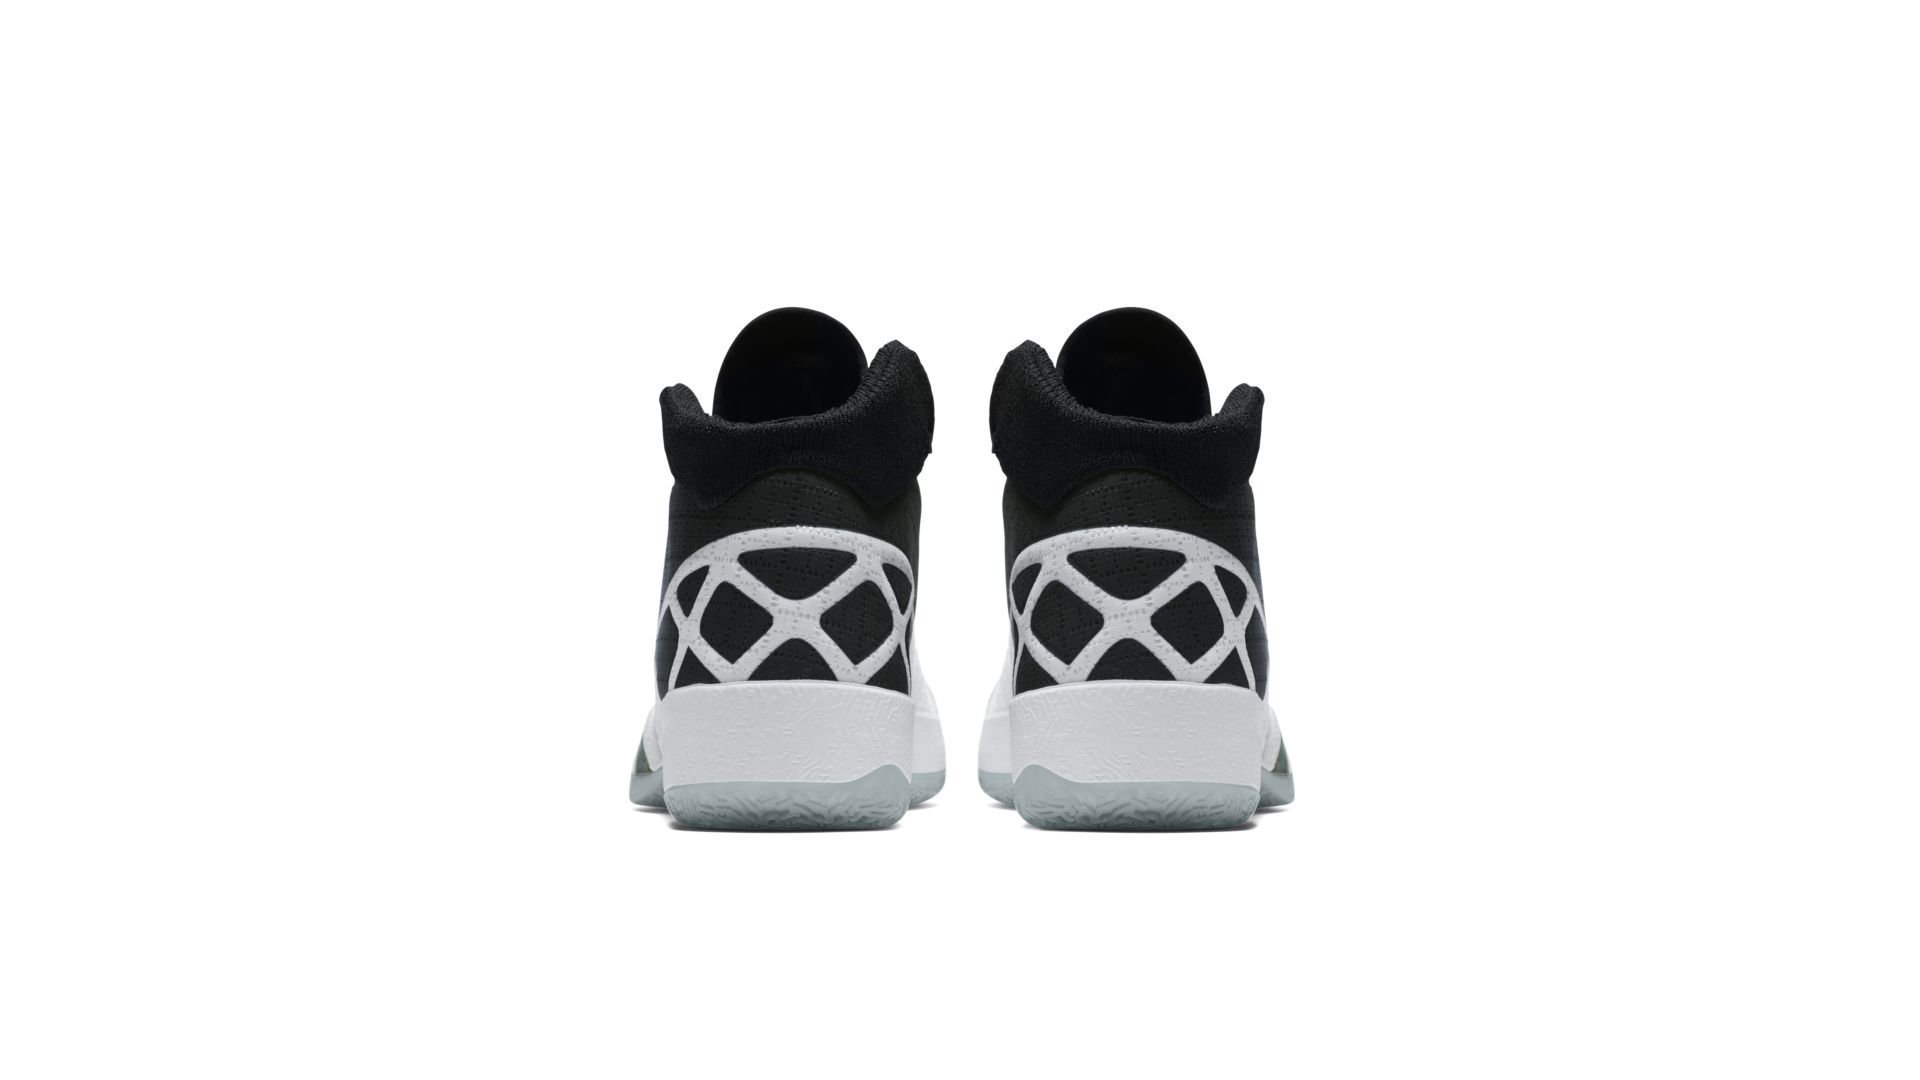 Jordan XXX White Black (811006-101)